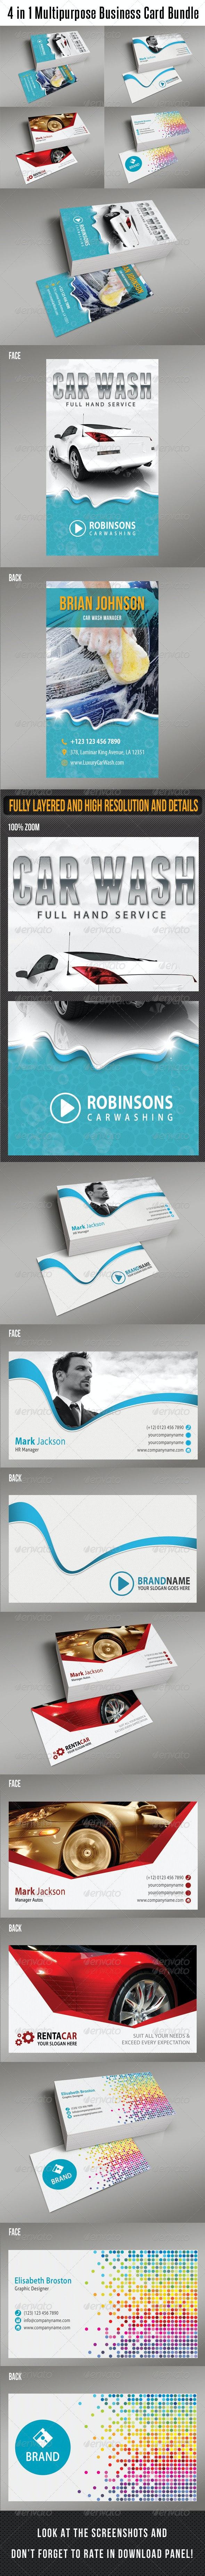 4 in 1 Multipurpose Business Card Bundle 03 - Creative Business Cards